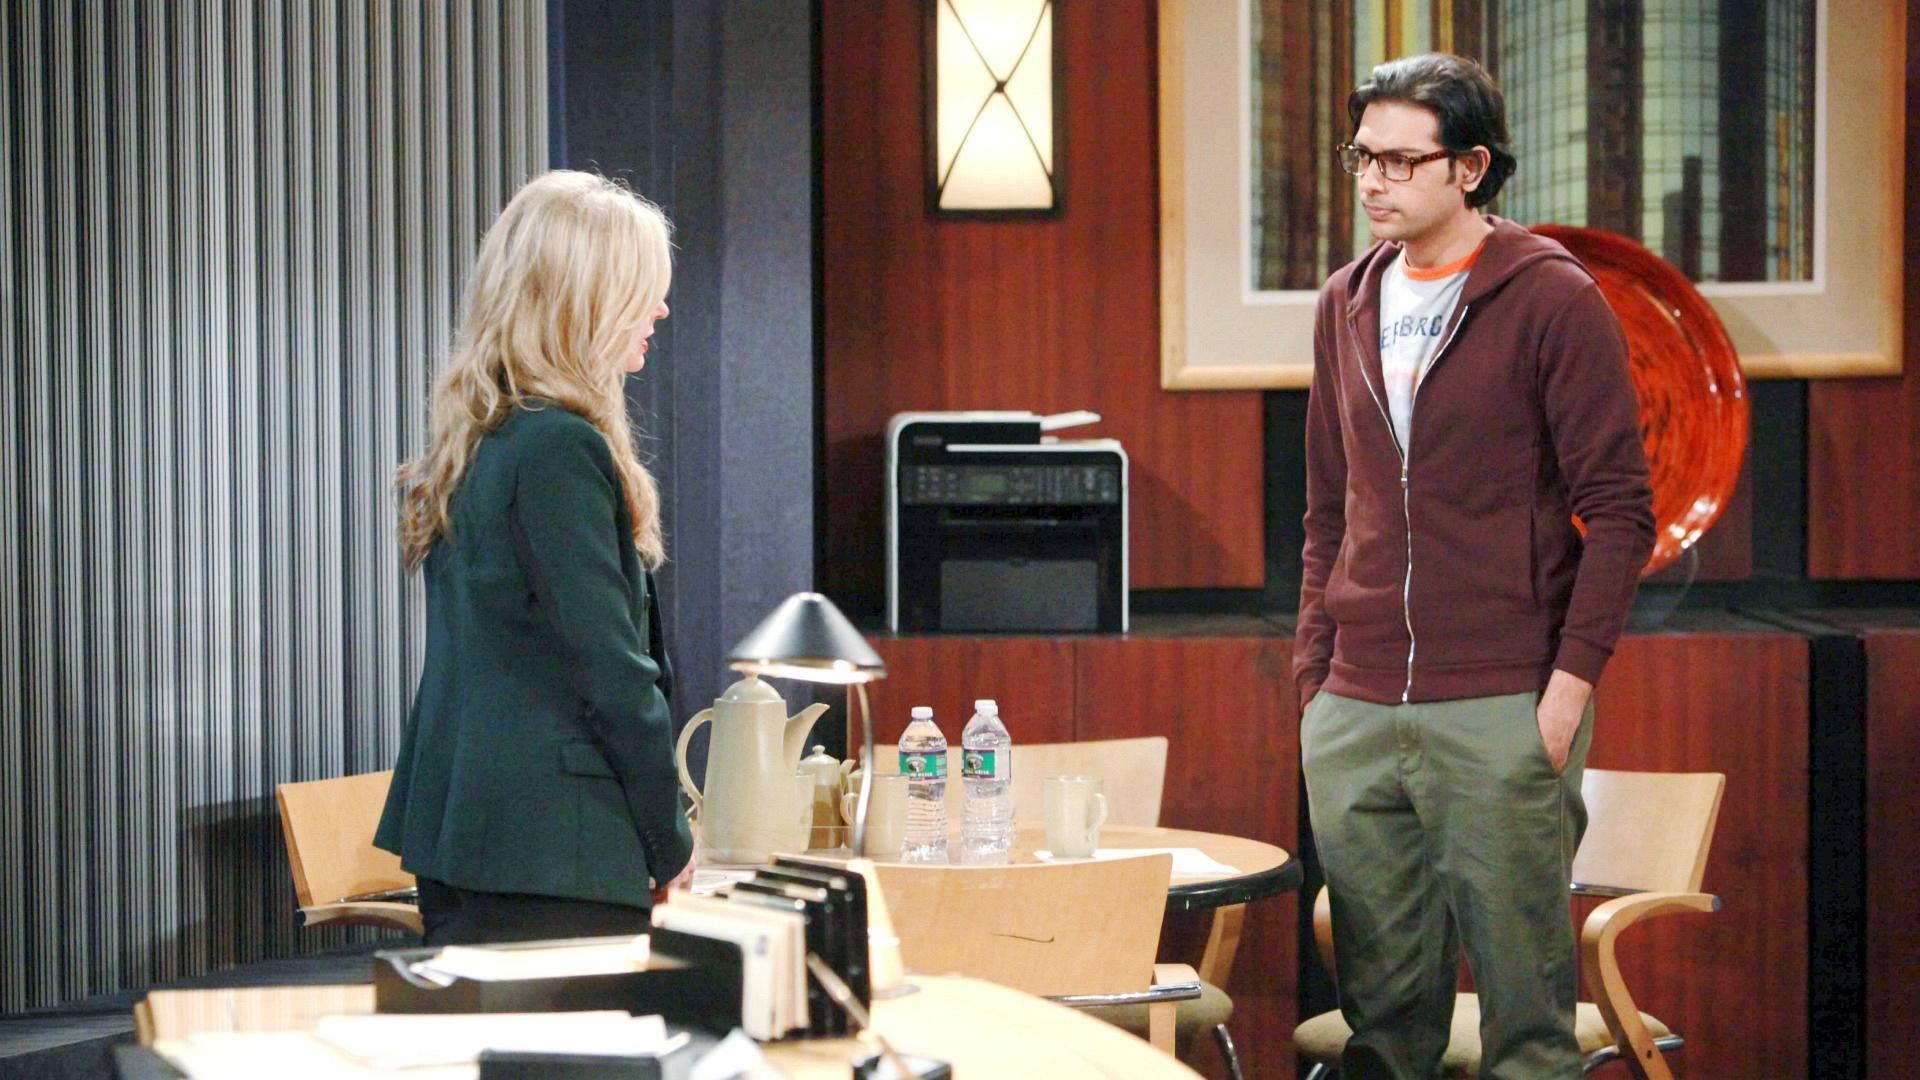 Ravi comforts Ashley.